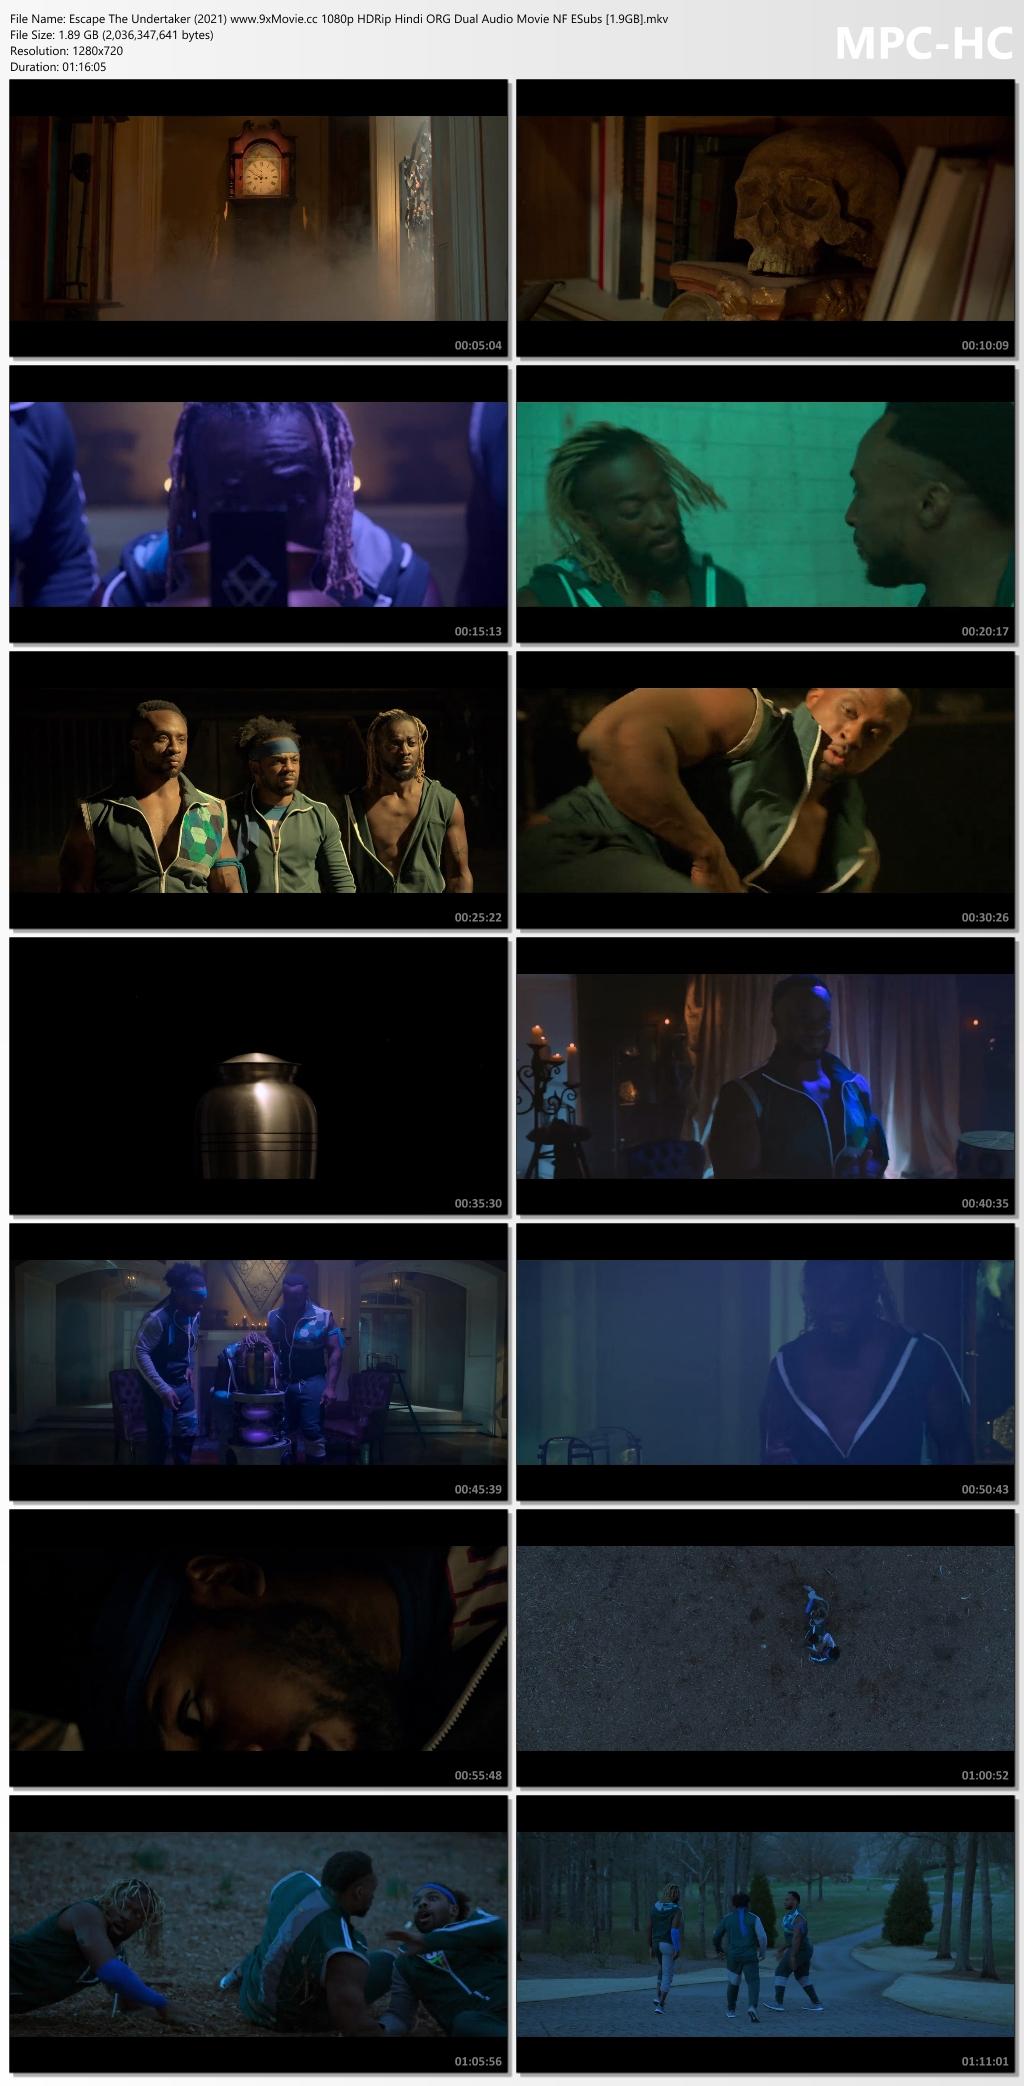 Escape-The-Undertaker-2021-www-9x-Movie-cc-1080p-HDRip-Hindi-ORG-Dual-Audio-Movie-NF-ESubs-1-9-GB-mk